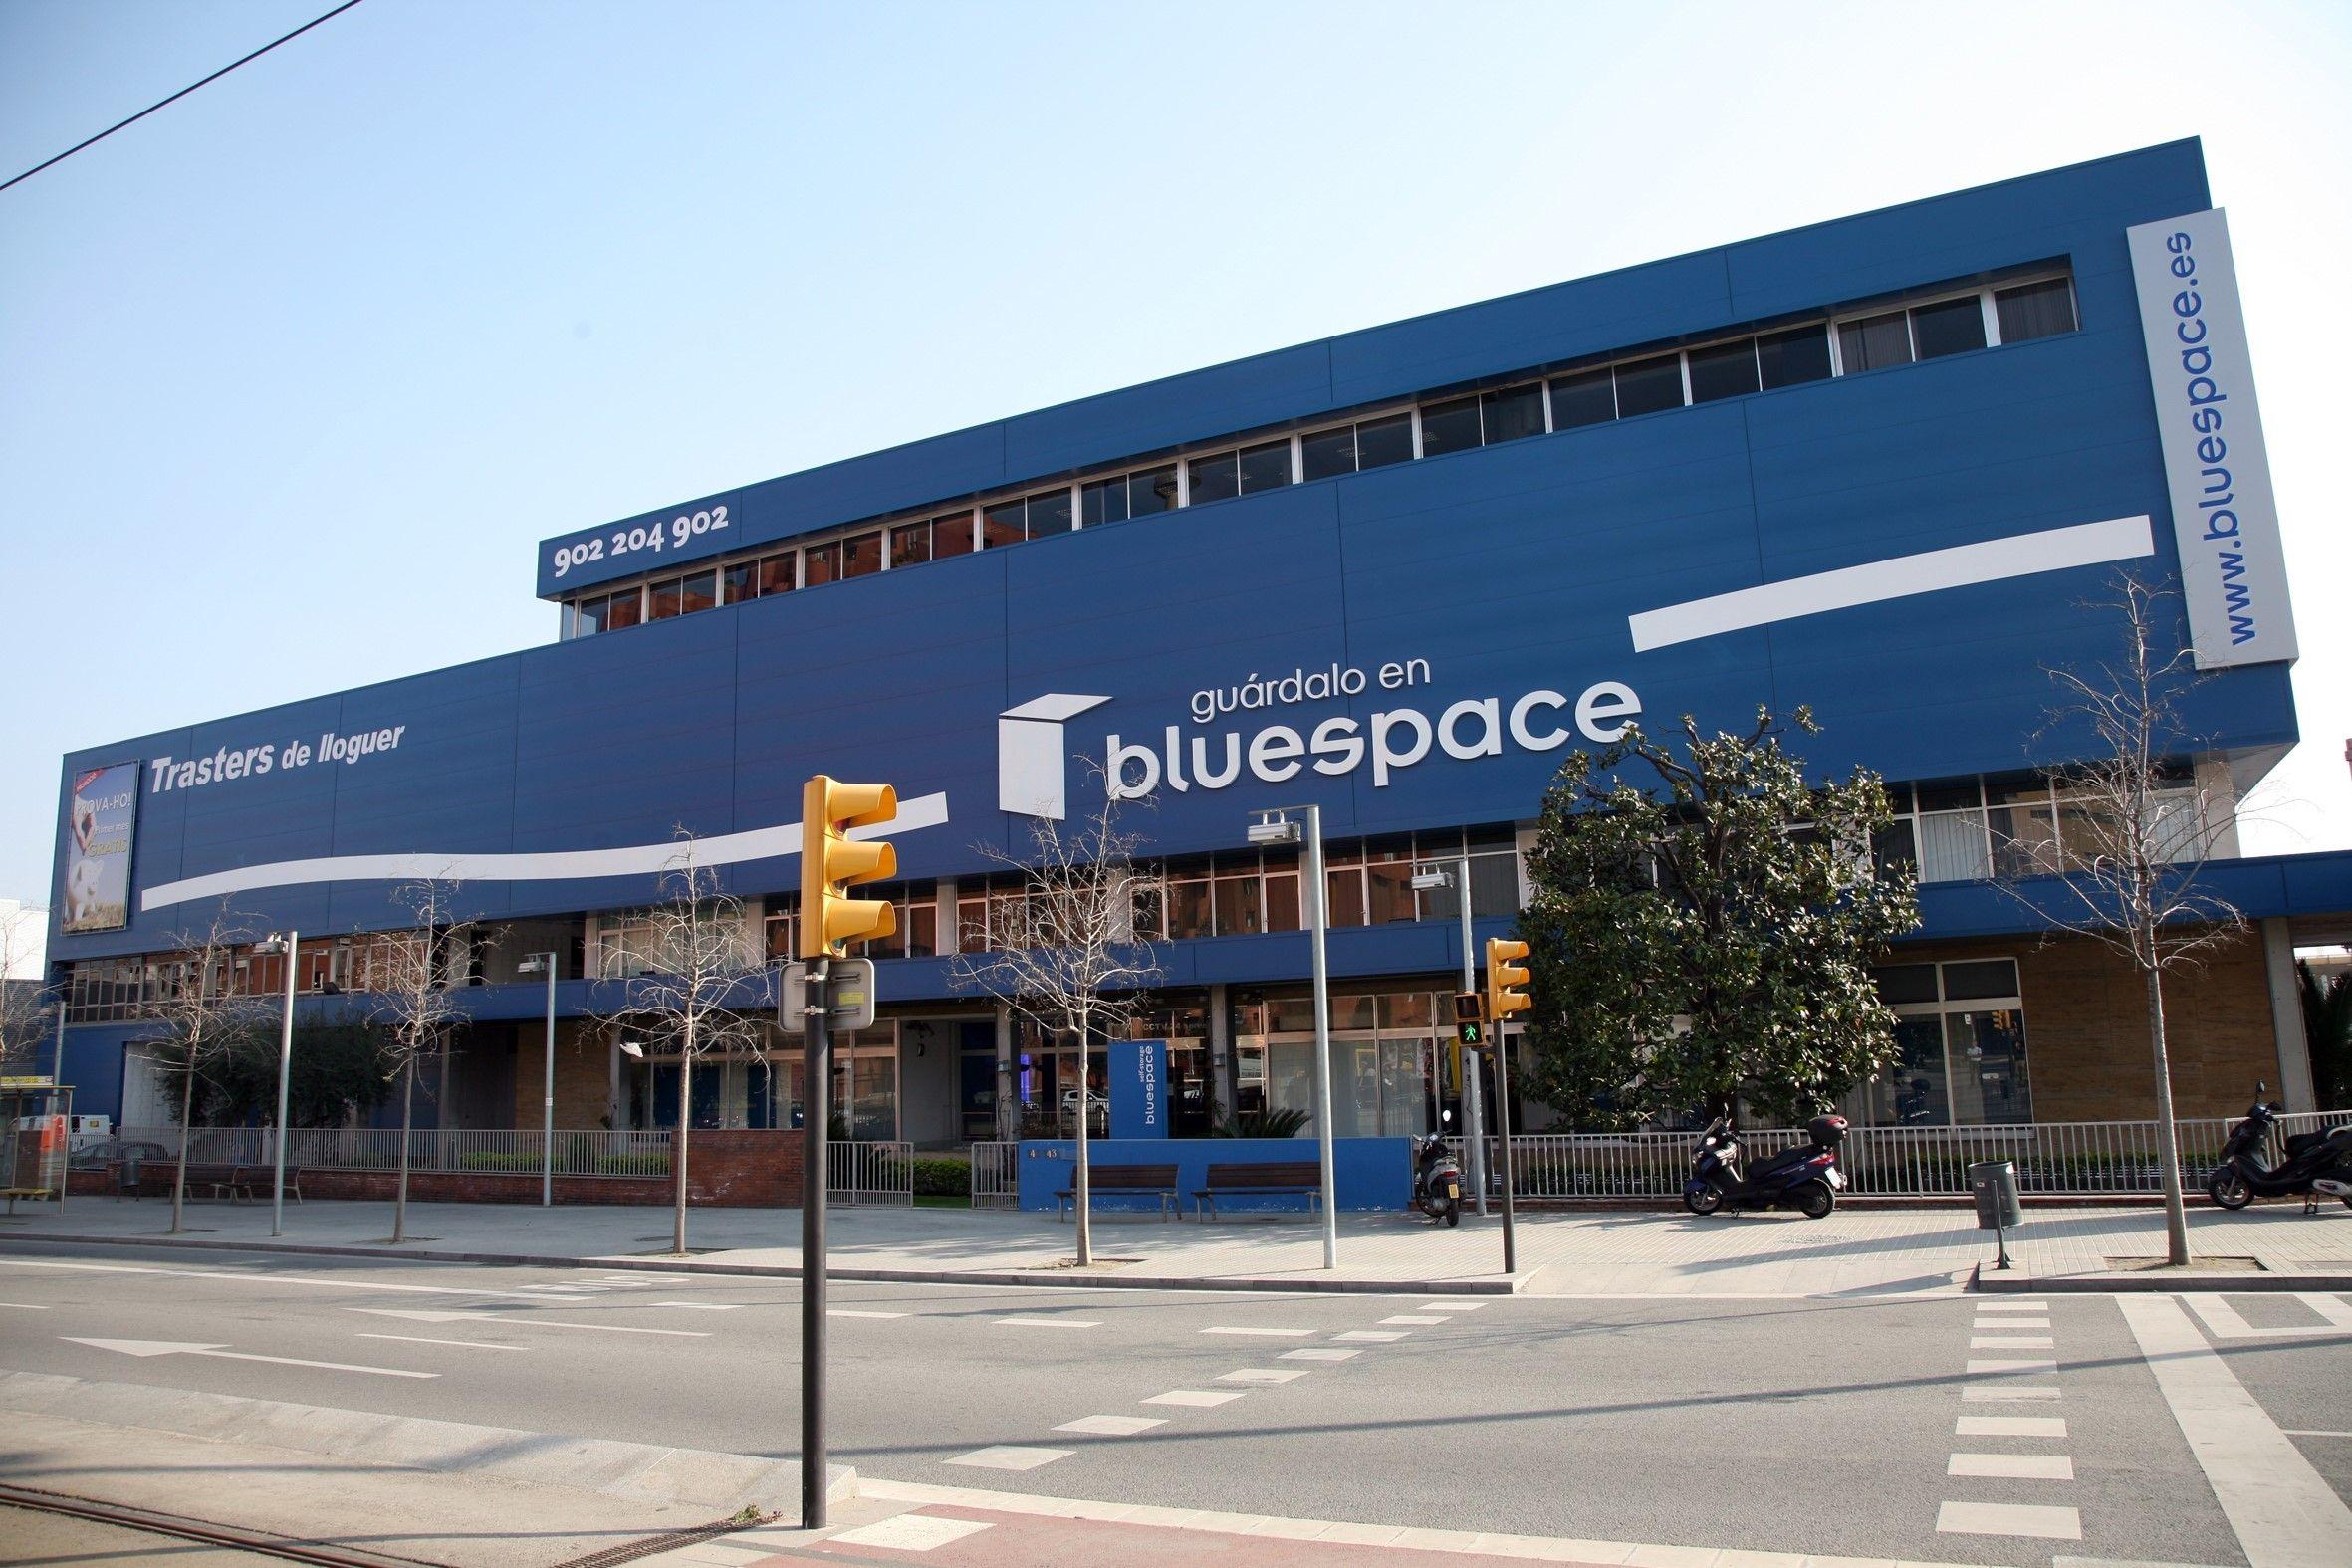 Foto de Edificio Bluespace